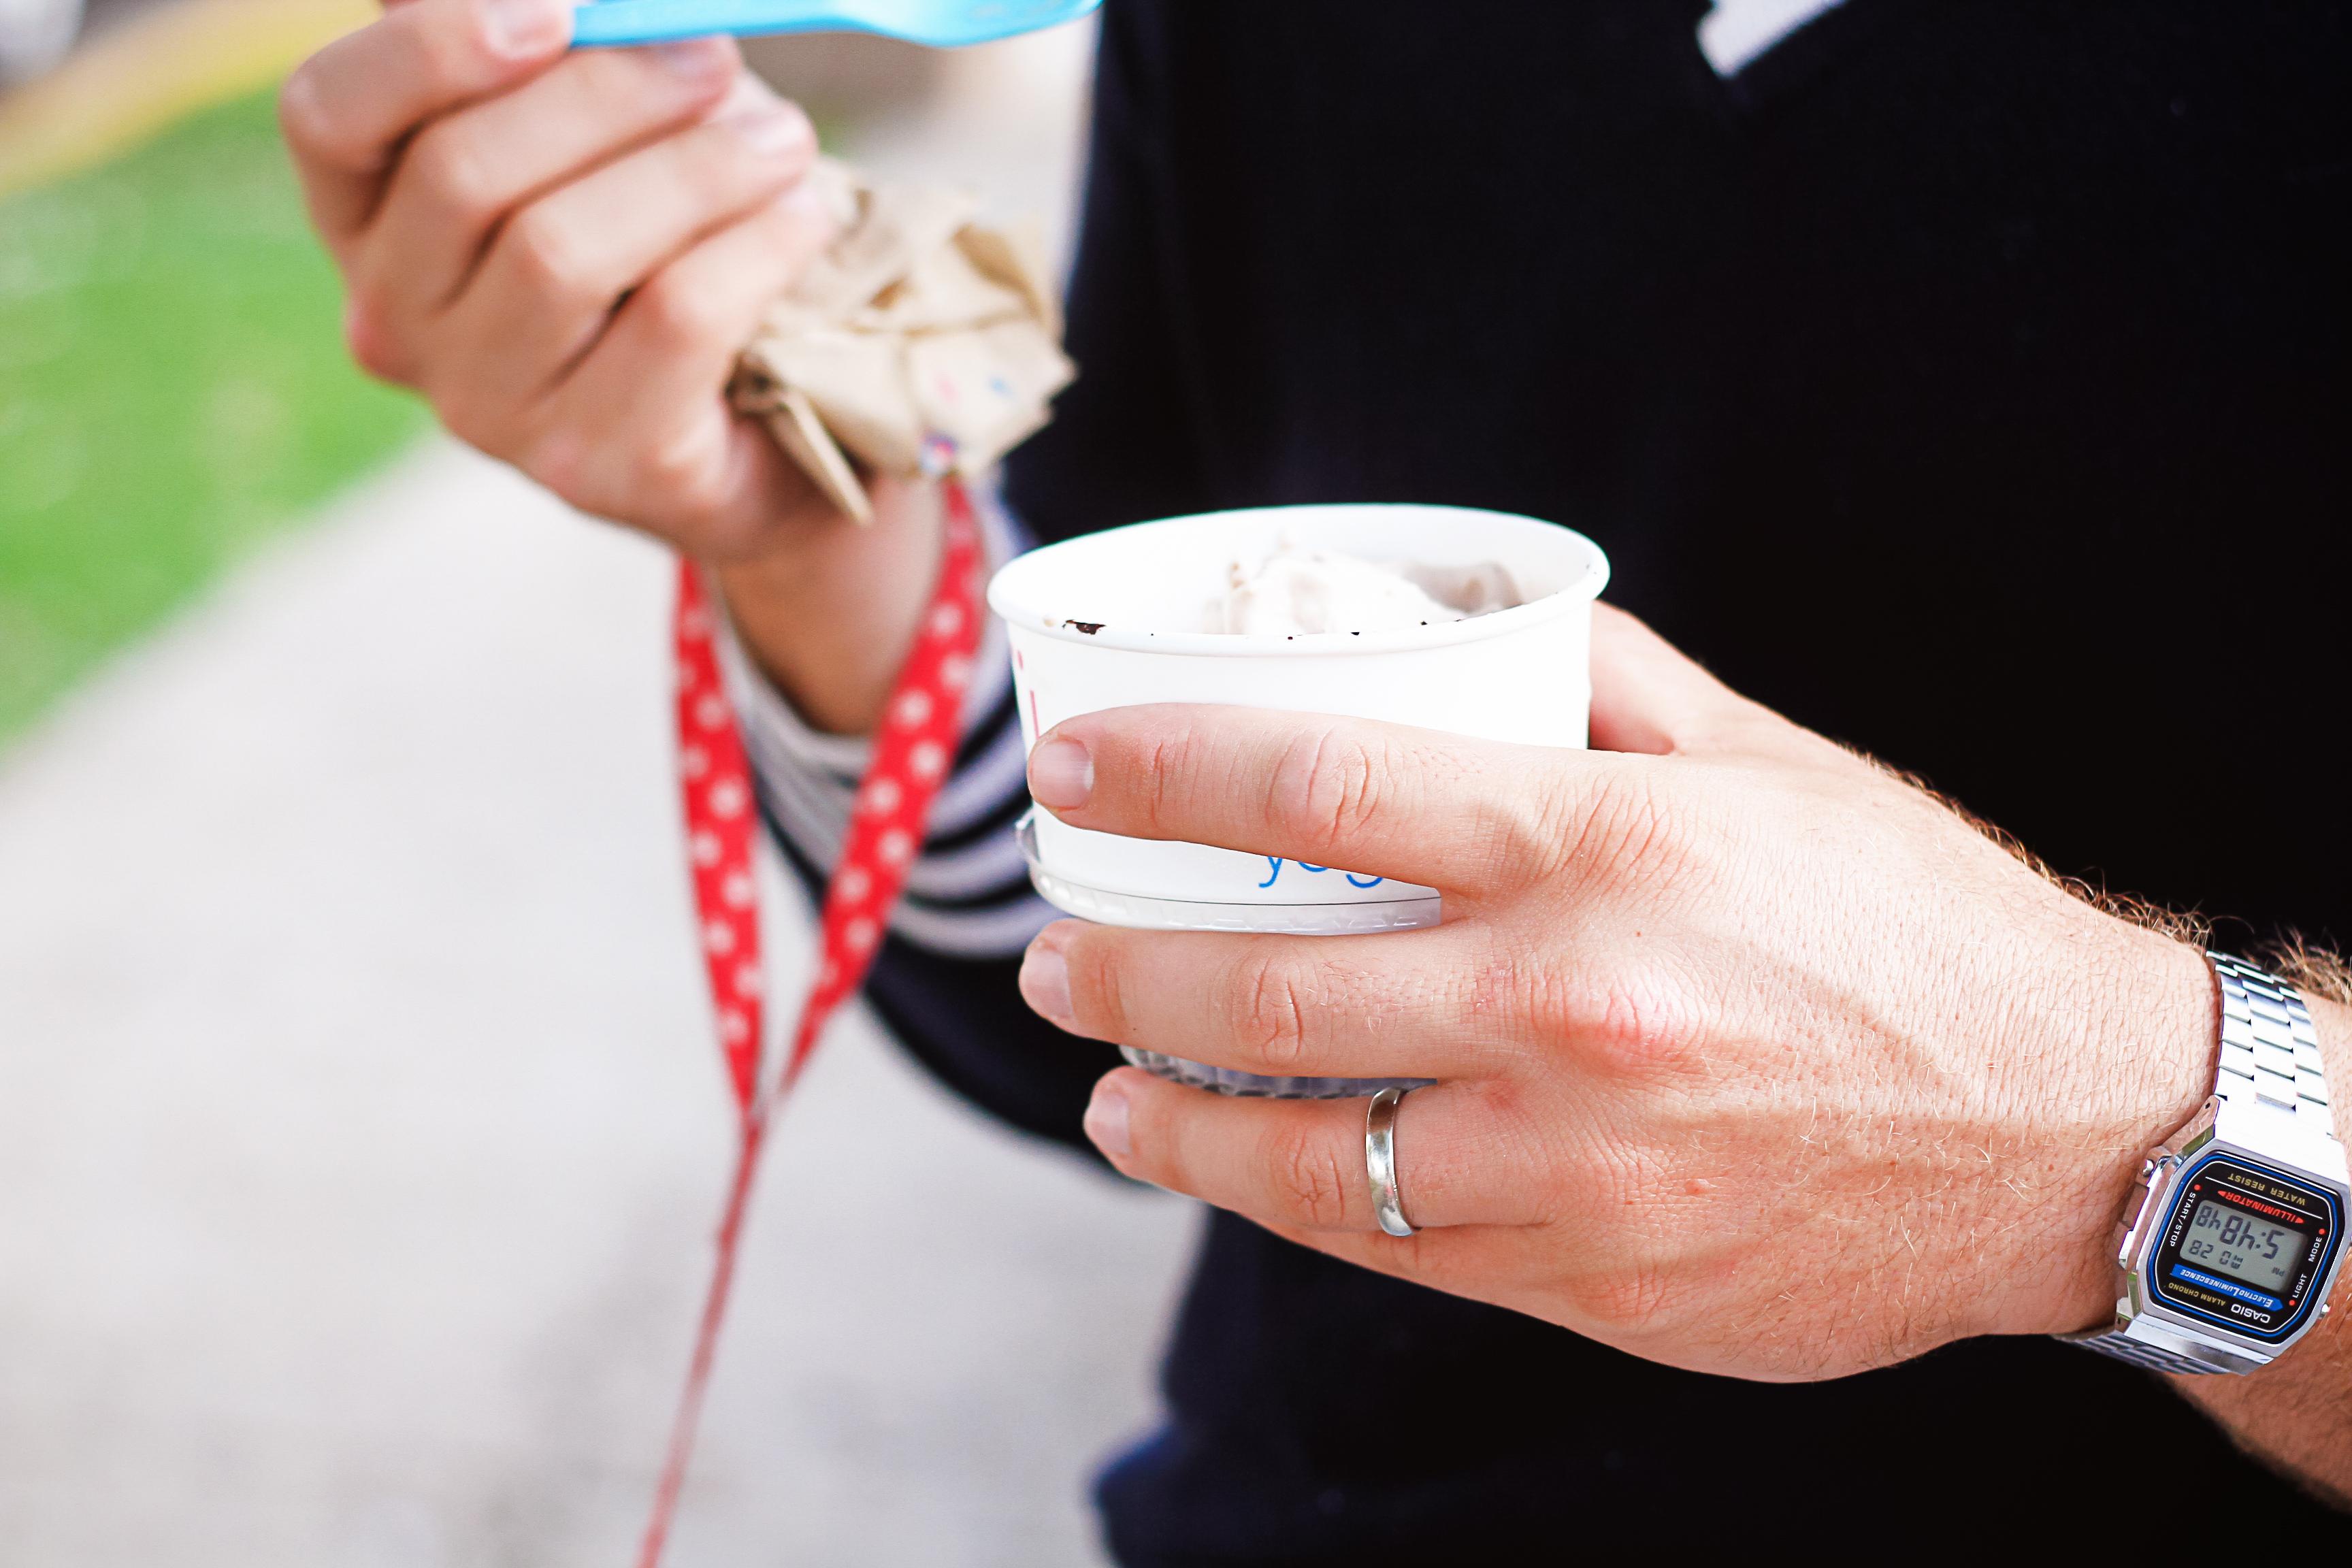 Day in the Life: Desserts & Güiffi